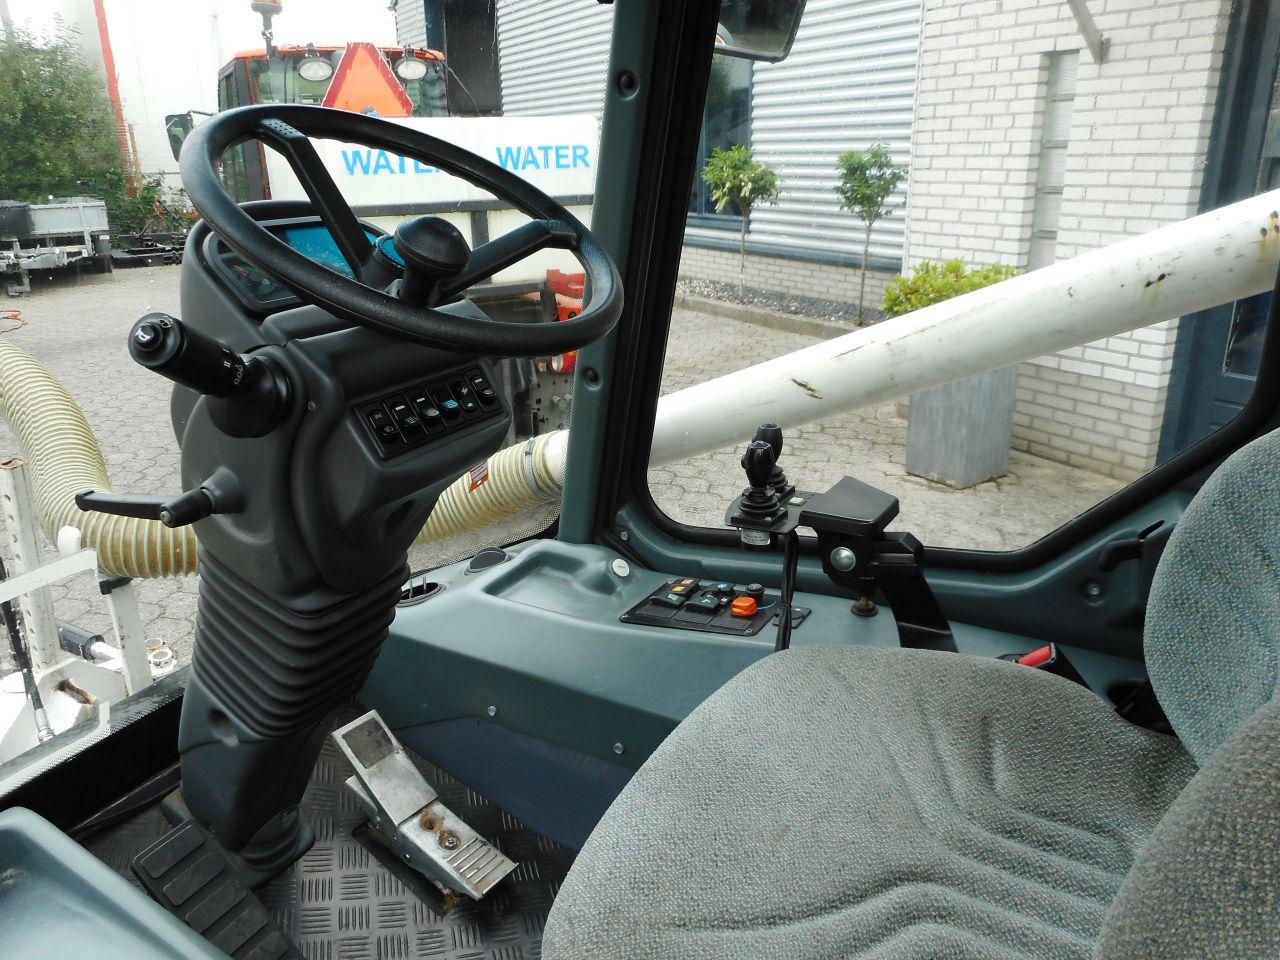 LM-trac 286 poepzuiger/onkruidborstel